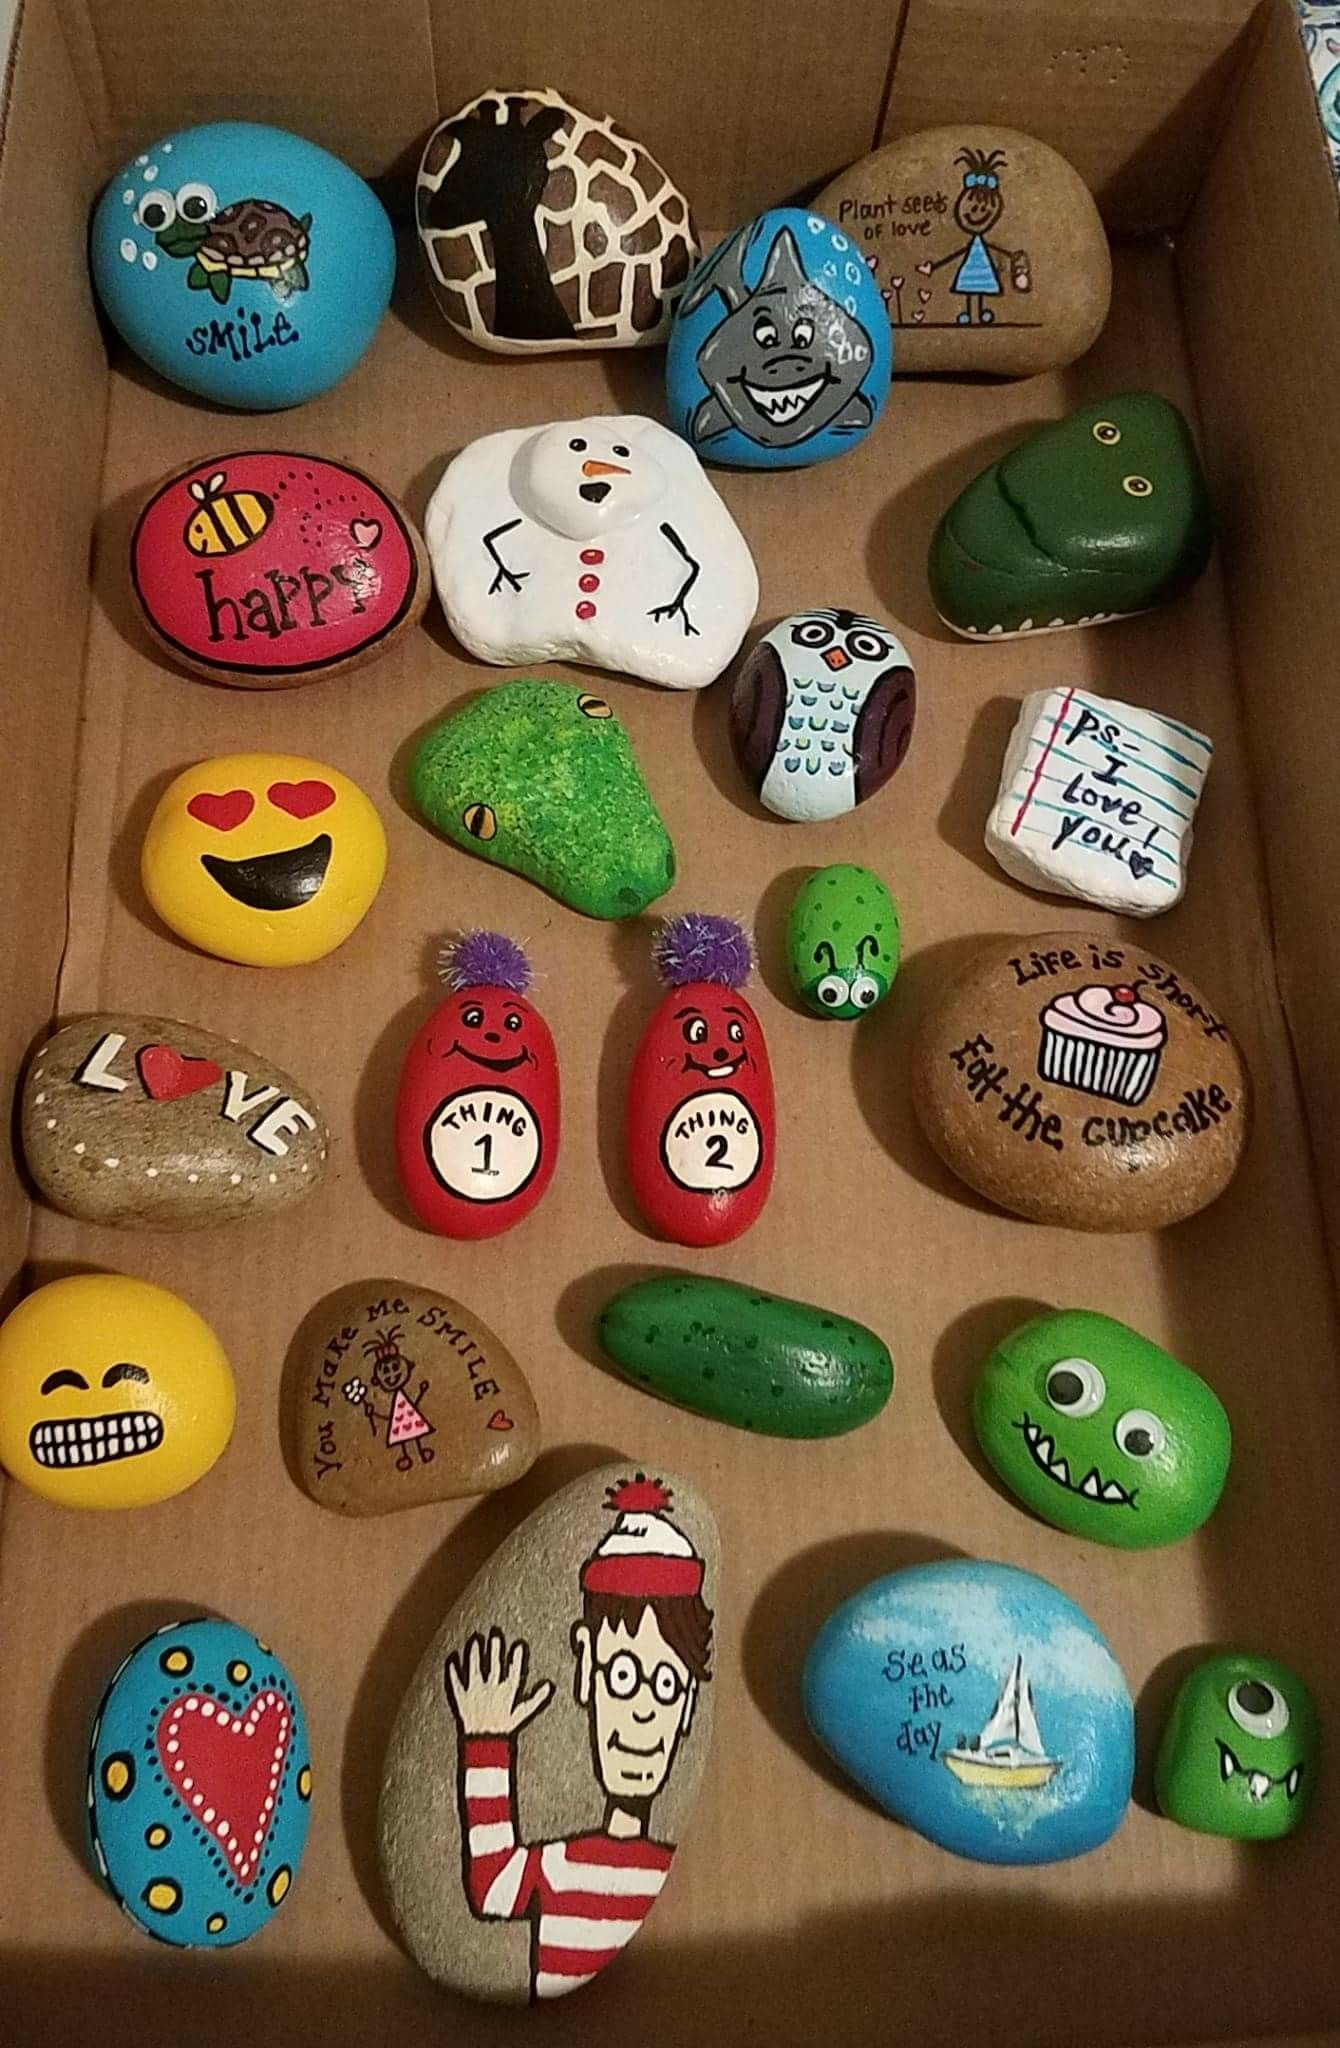 Thing 1 Thing 2 Diy Easy Rock Paint Ideas Art Kids Rock Painting Designs Painted Rocks Rock Painting Ideas Easy